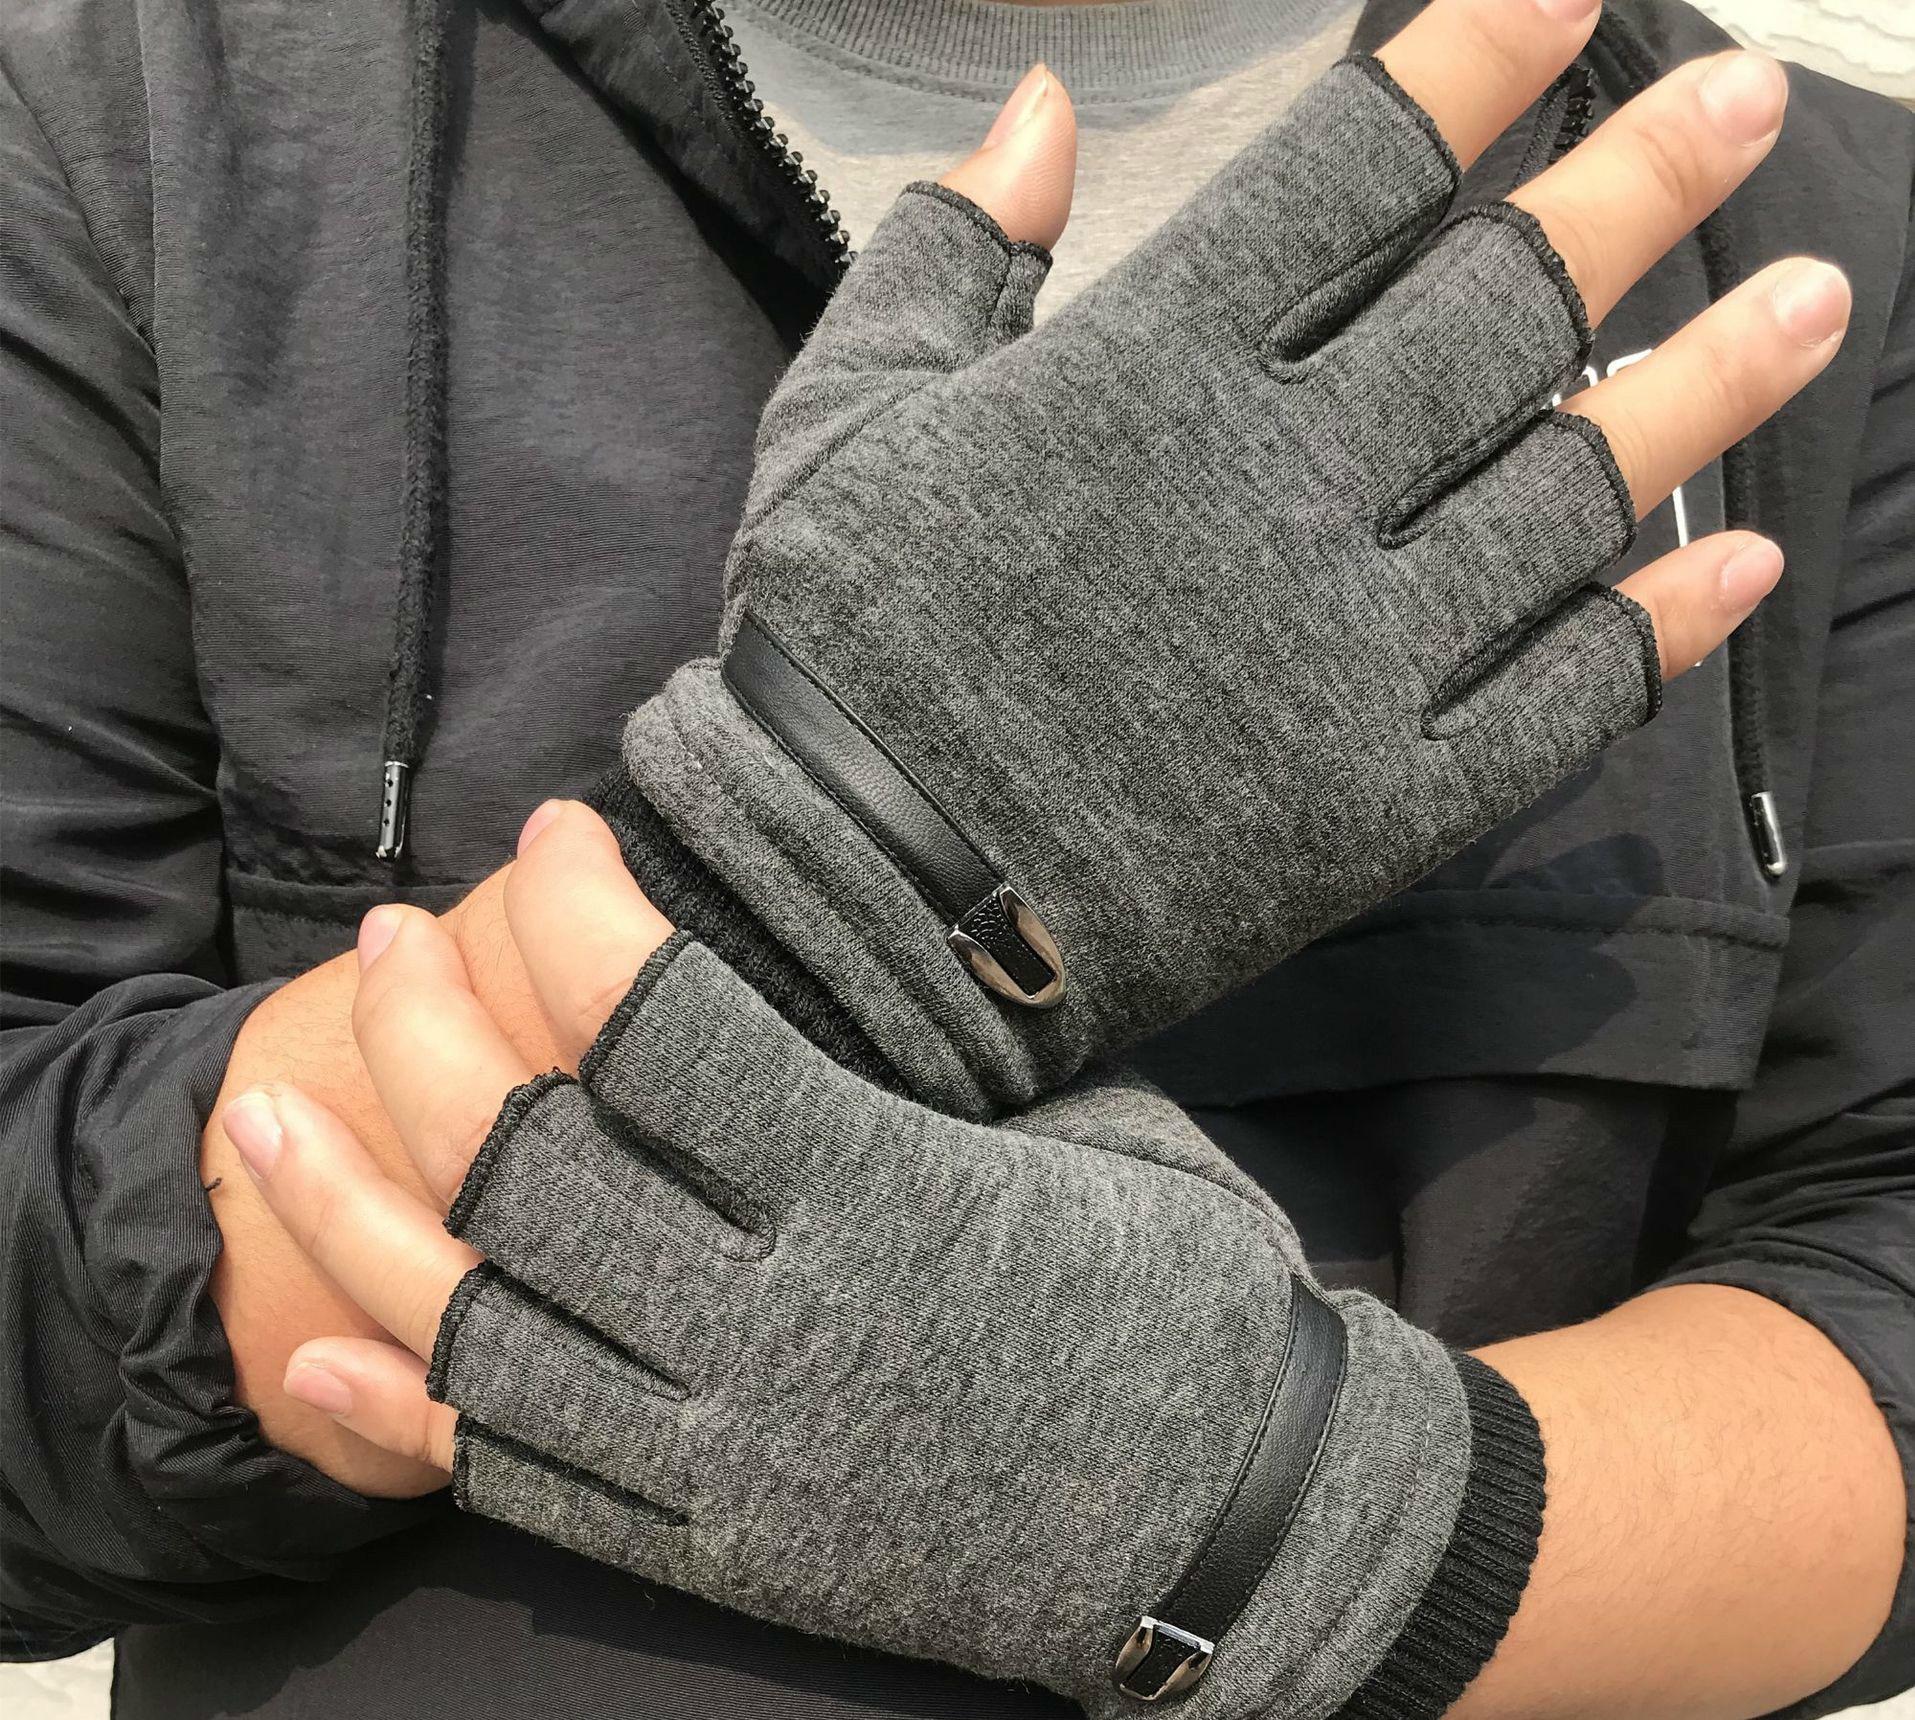 1 Pair New Fashion Unisex Men Women Warm Magic Knitted Stretch Elastic Mitten Half Finger Fingerless Gloves Prepare For Winter